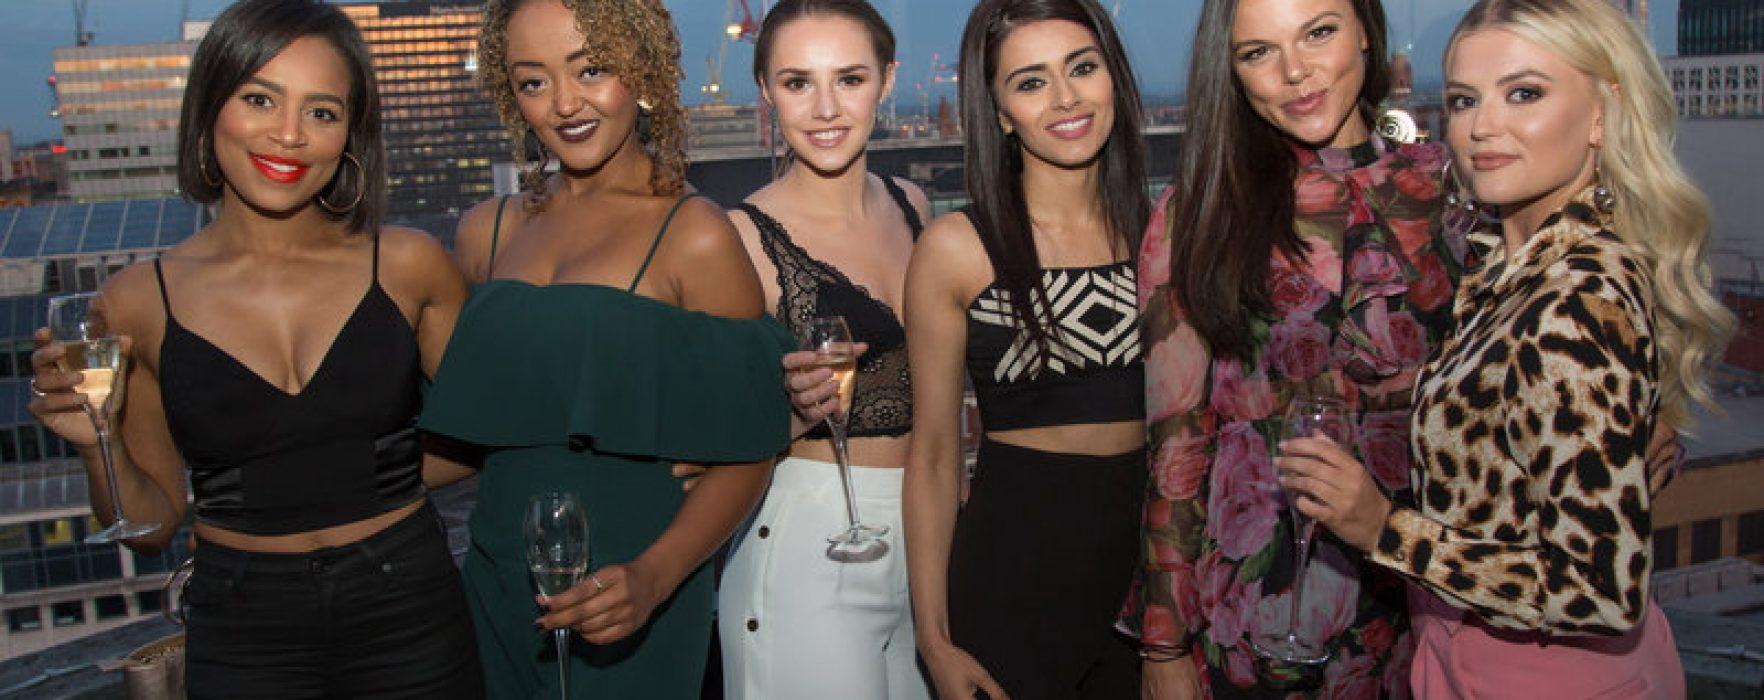 Hotel Gotham Celebrates Third Birthday with a VIP Celeb-filled Bash